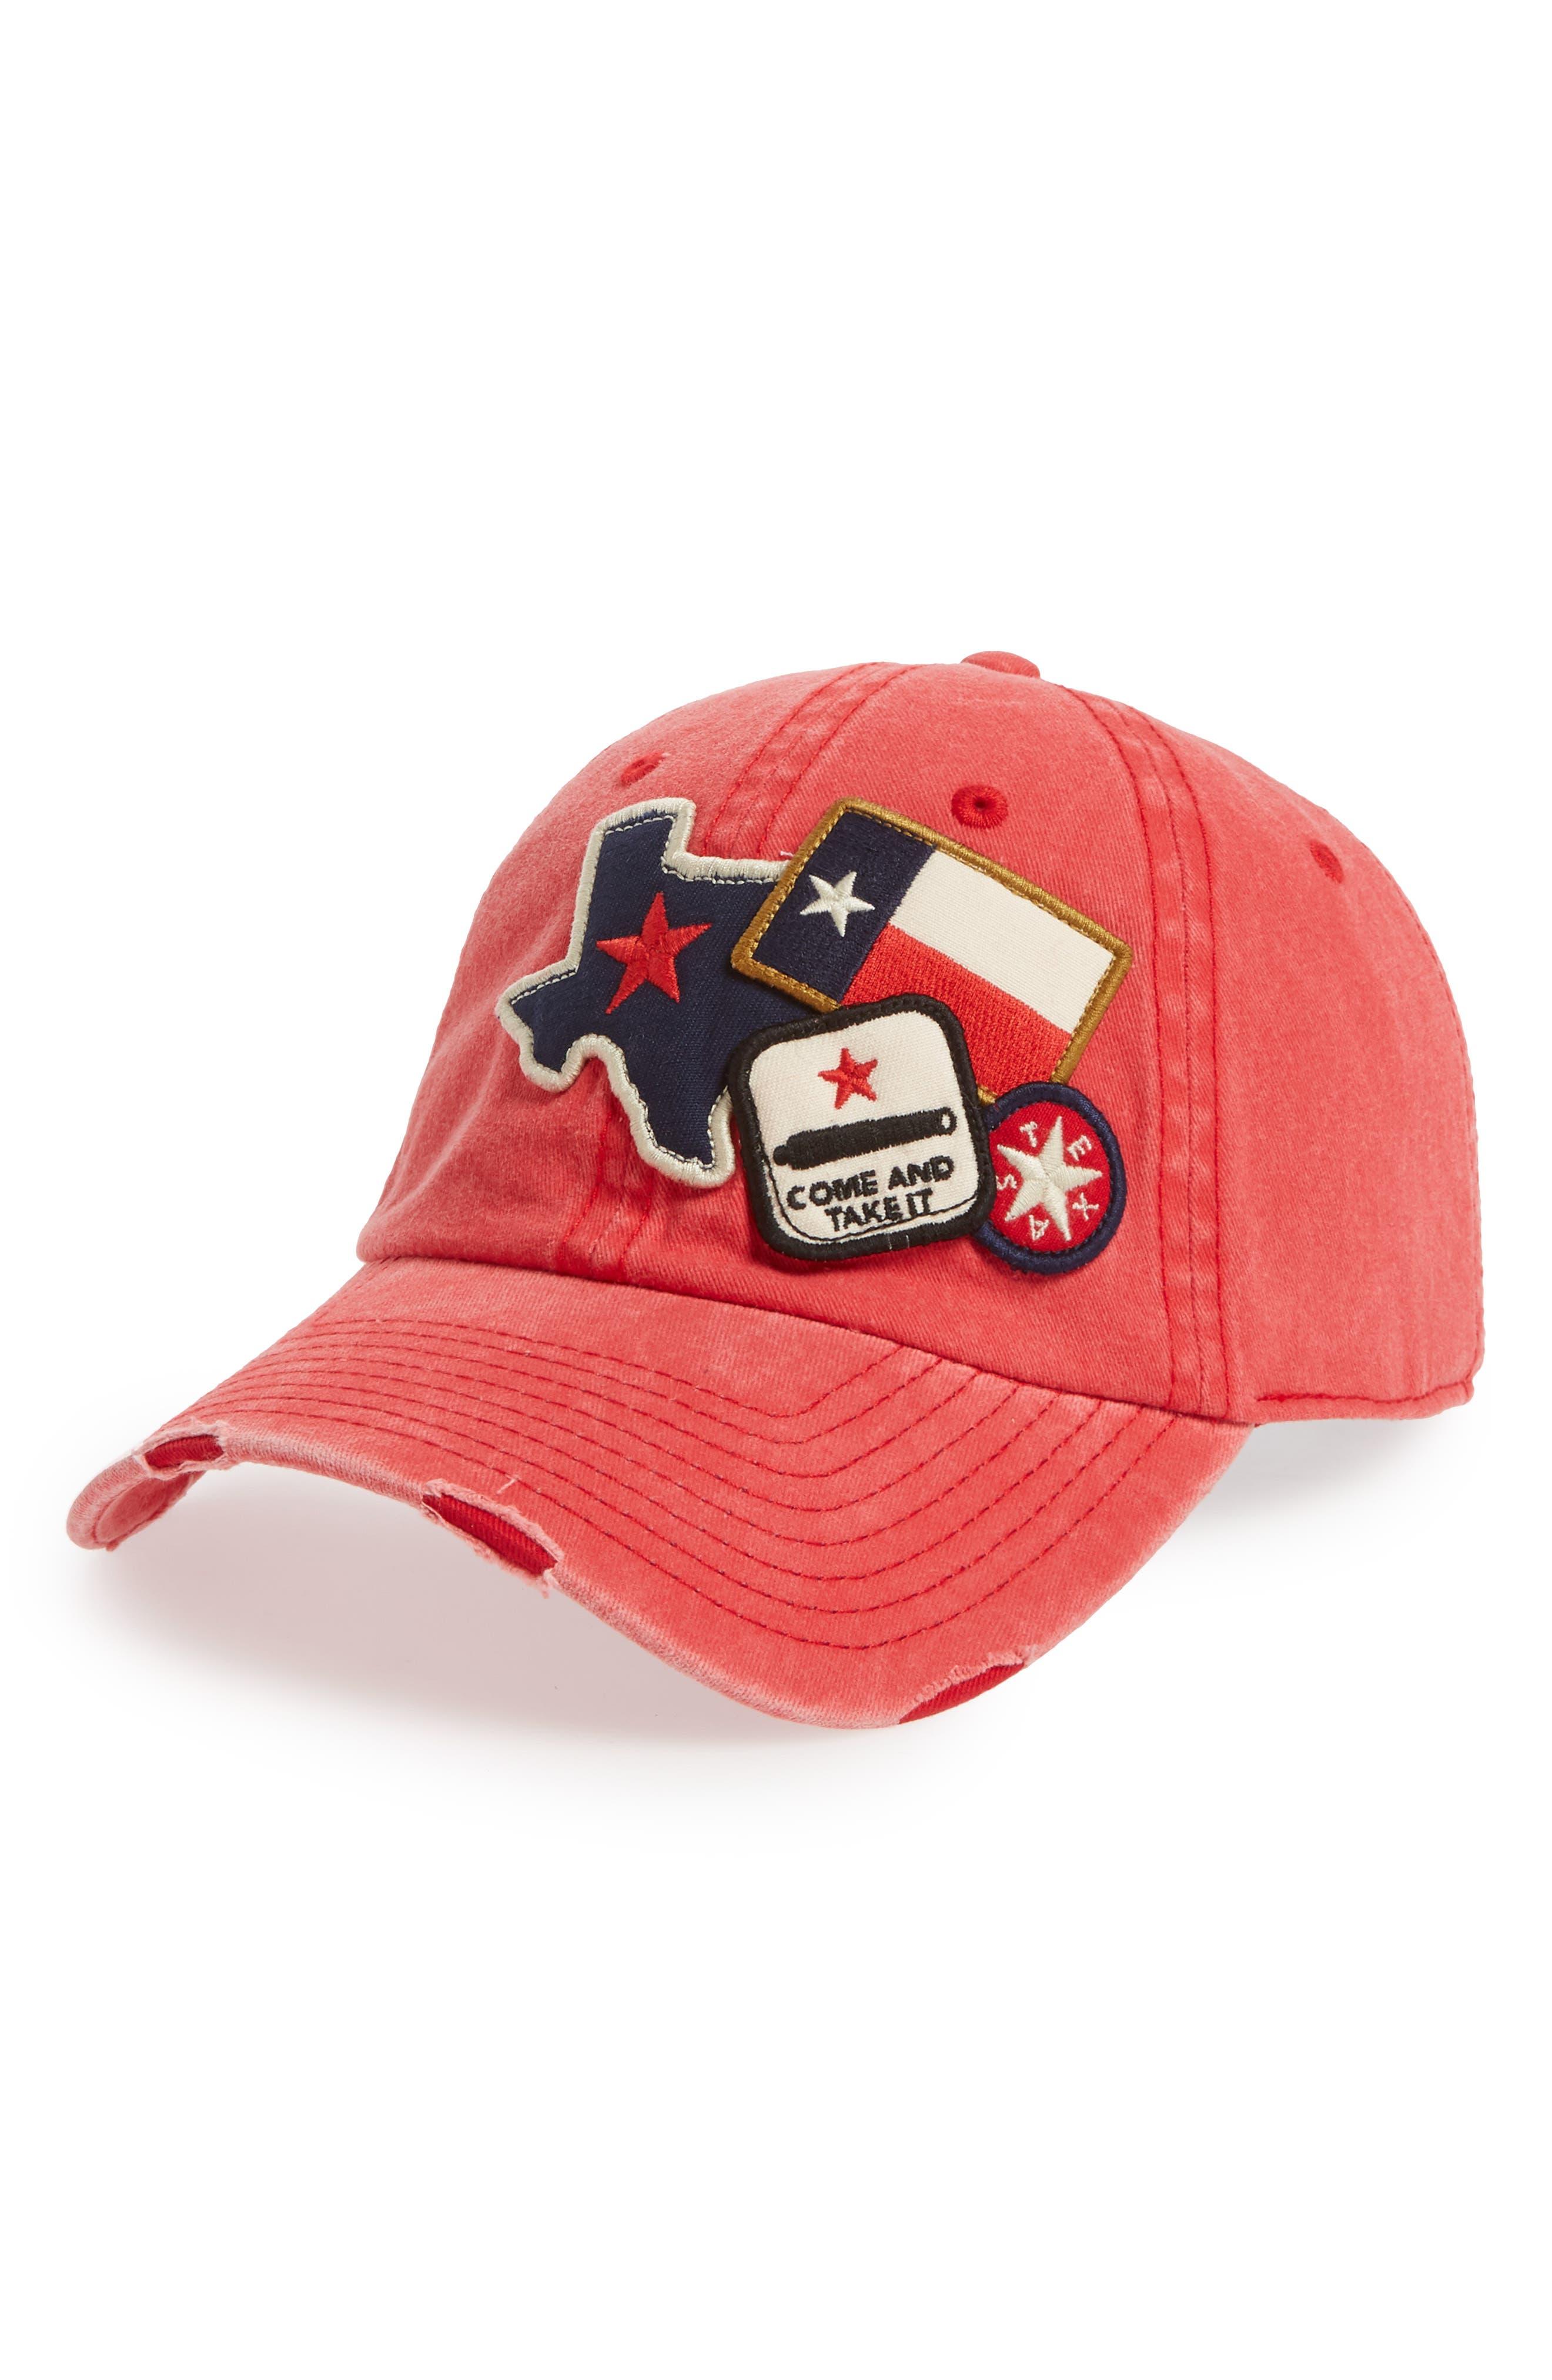 Iconic - Texas Ball Cap,                         Main,                         color, 600